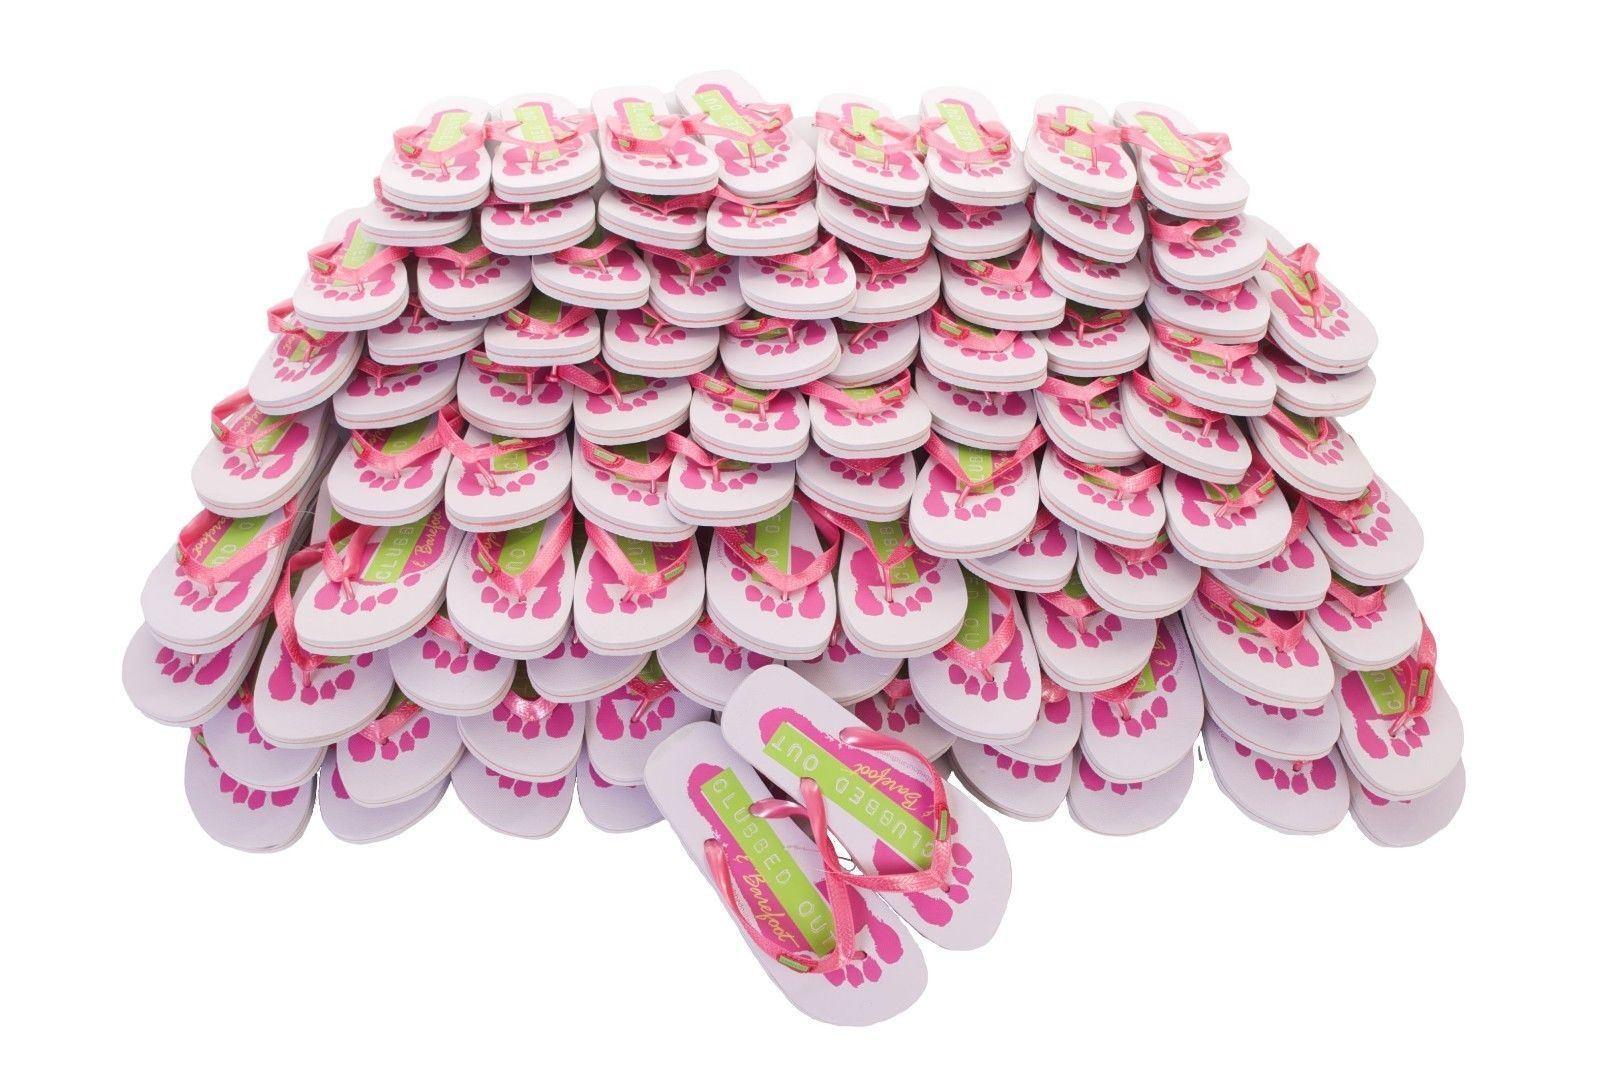 Zohula Clubbed Out and Barefoot Flip Flops - Bulk Kaufen 10 - 100 Paare | Produktqualität  | Elegantes Aussehen  | Neuankömmling